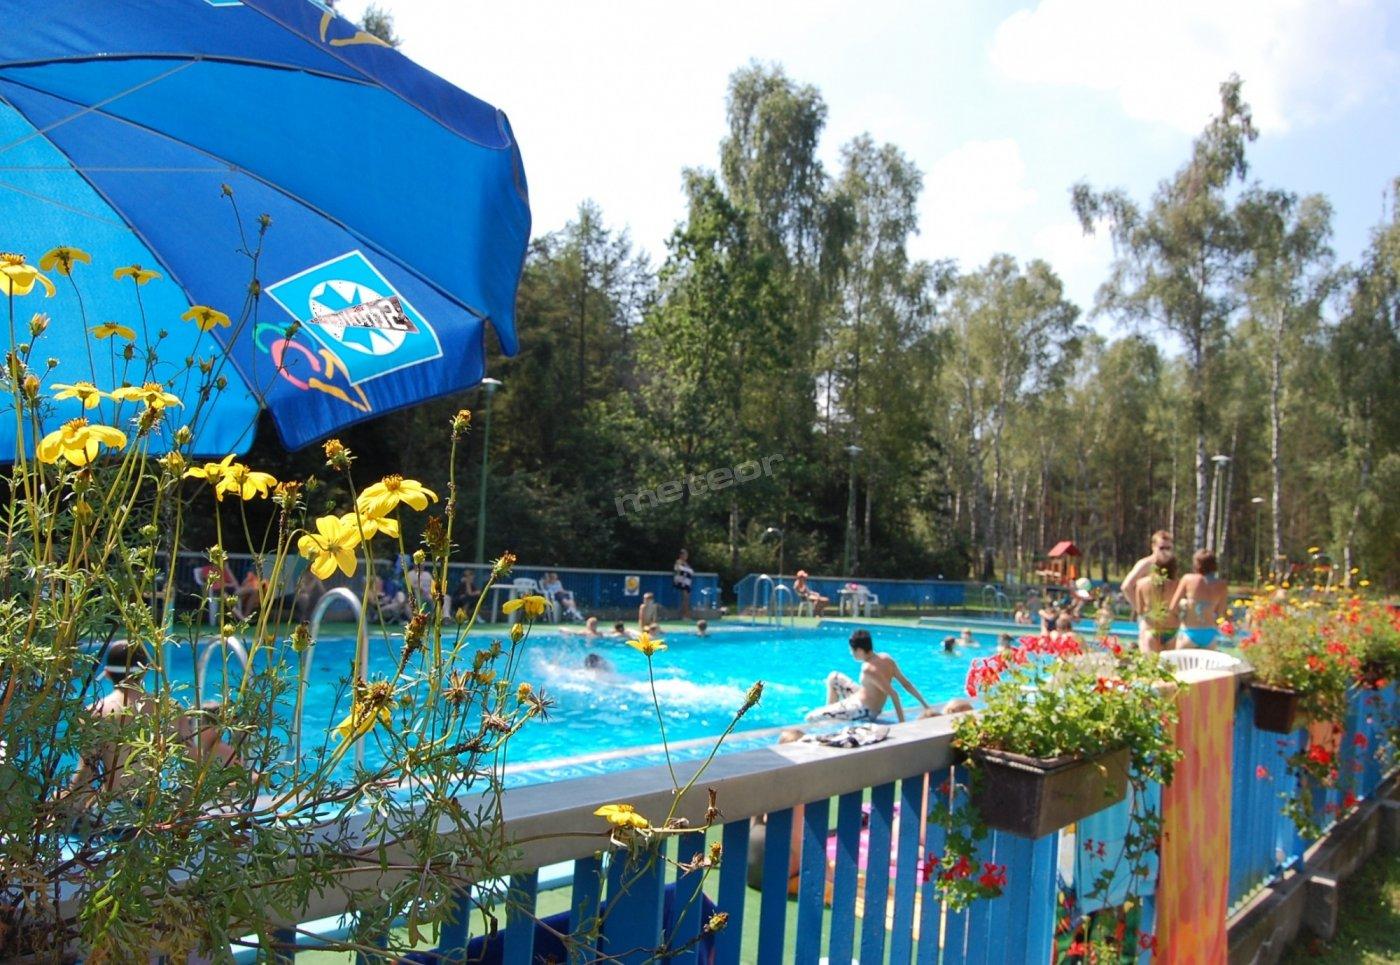 letni basen